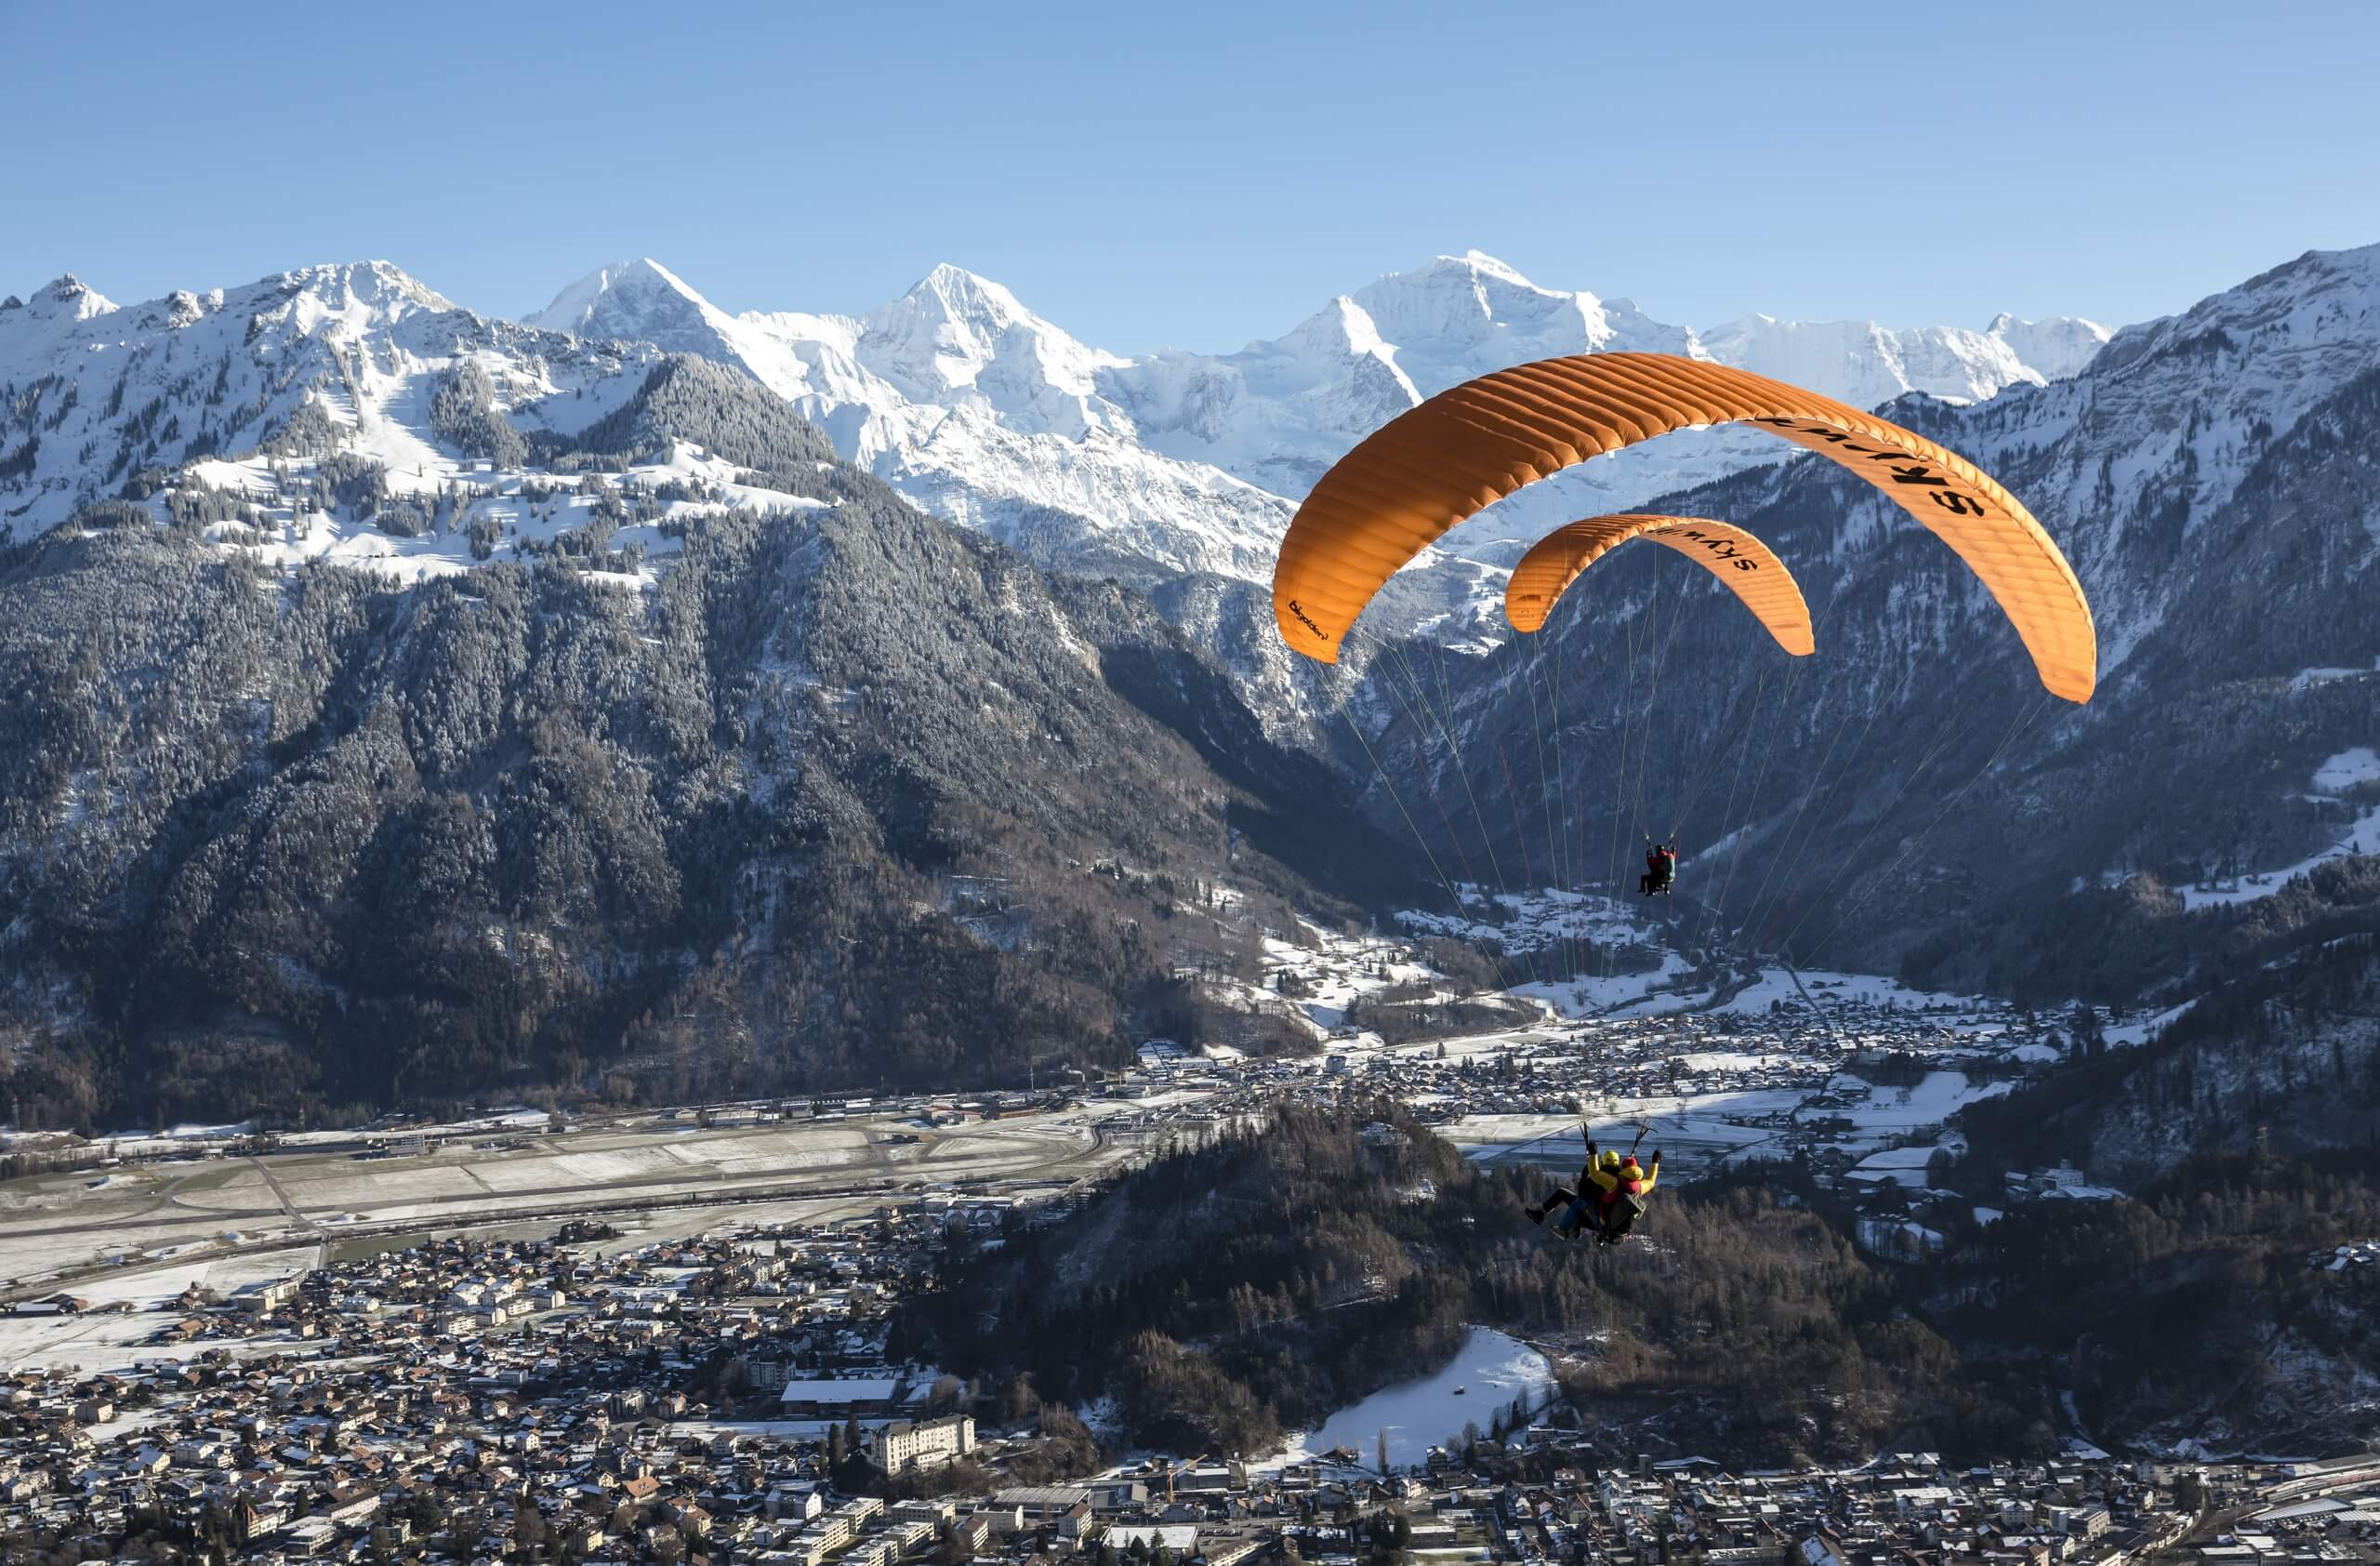 skywings-paragliding-interlaken-winter-mountains-snow-jungfrau